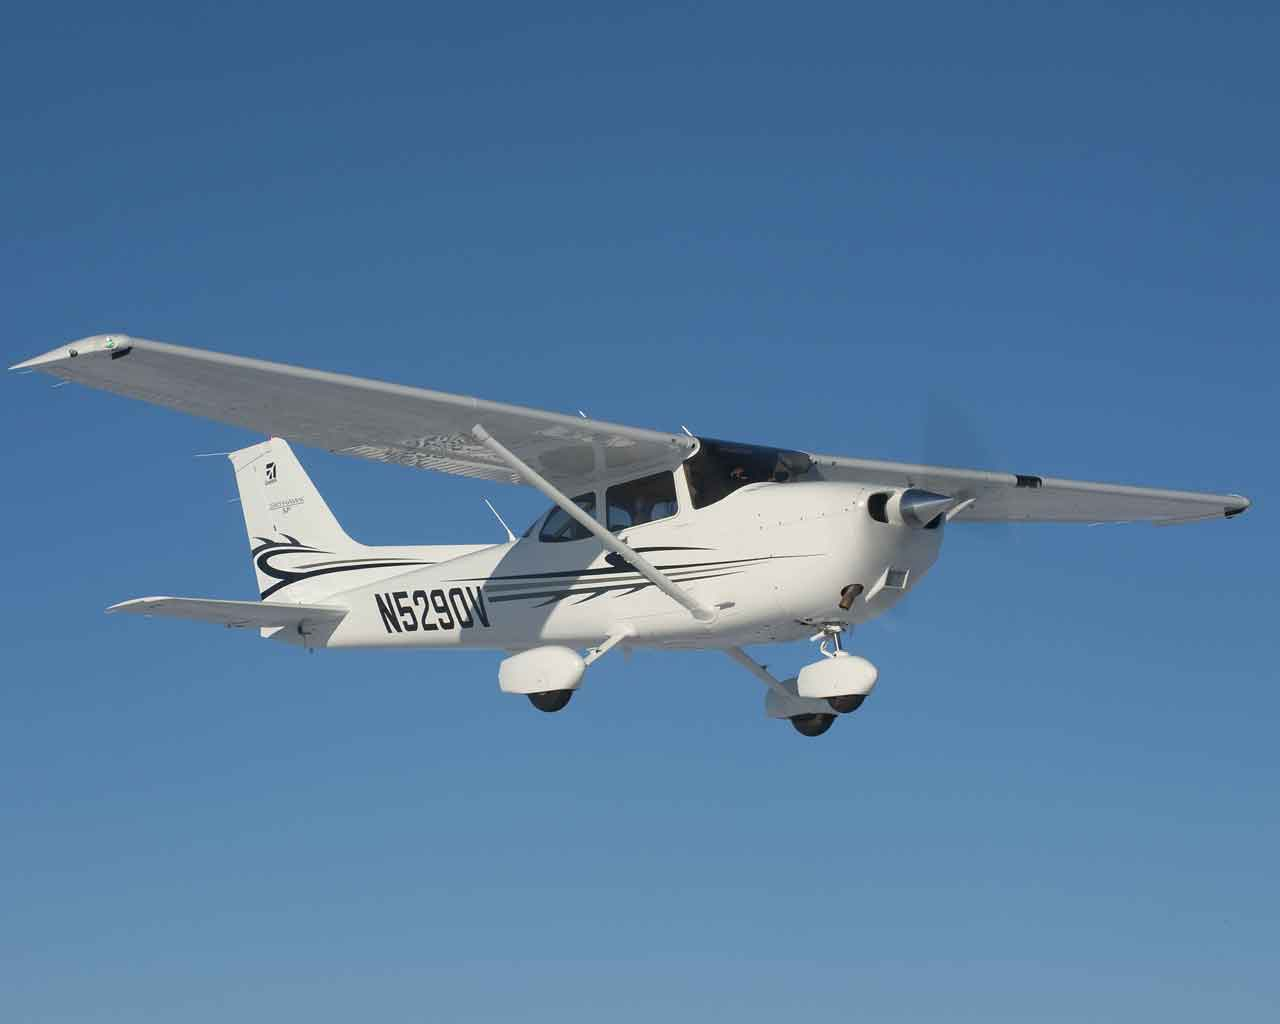 Cessna Skyhawk C172